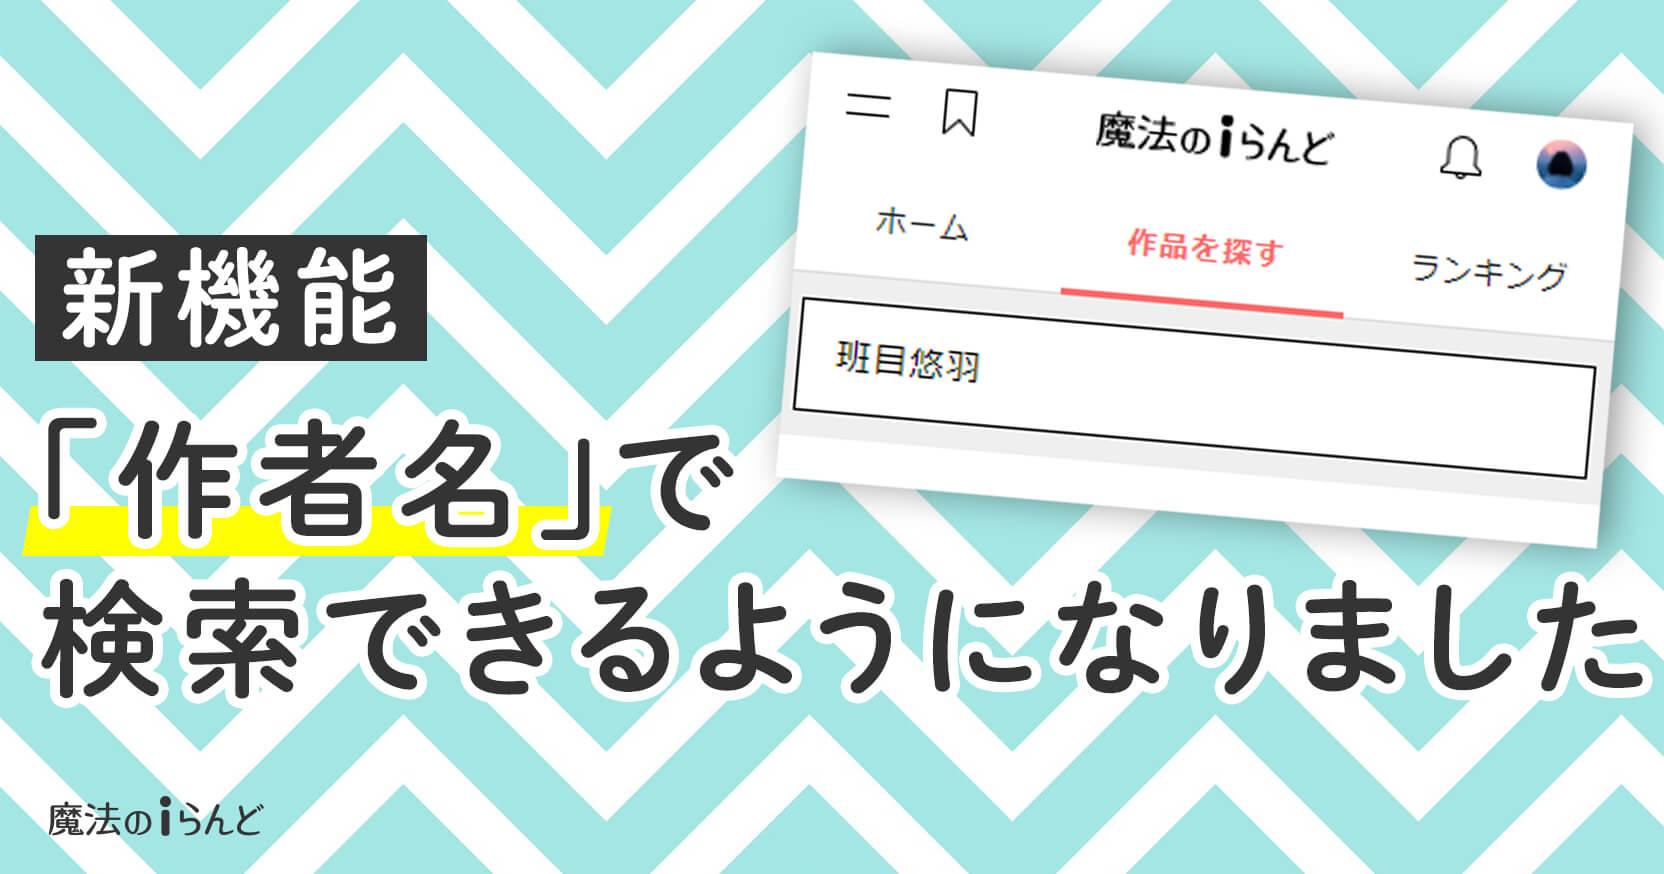 https://storage.googleapis.com/blog-info/entry/2021/06/sakkamei_ogp.jpg